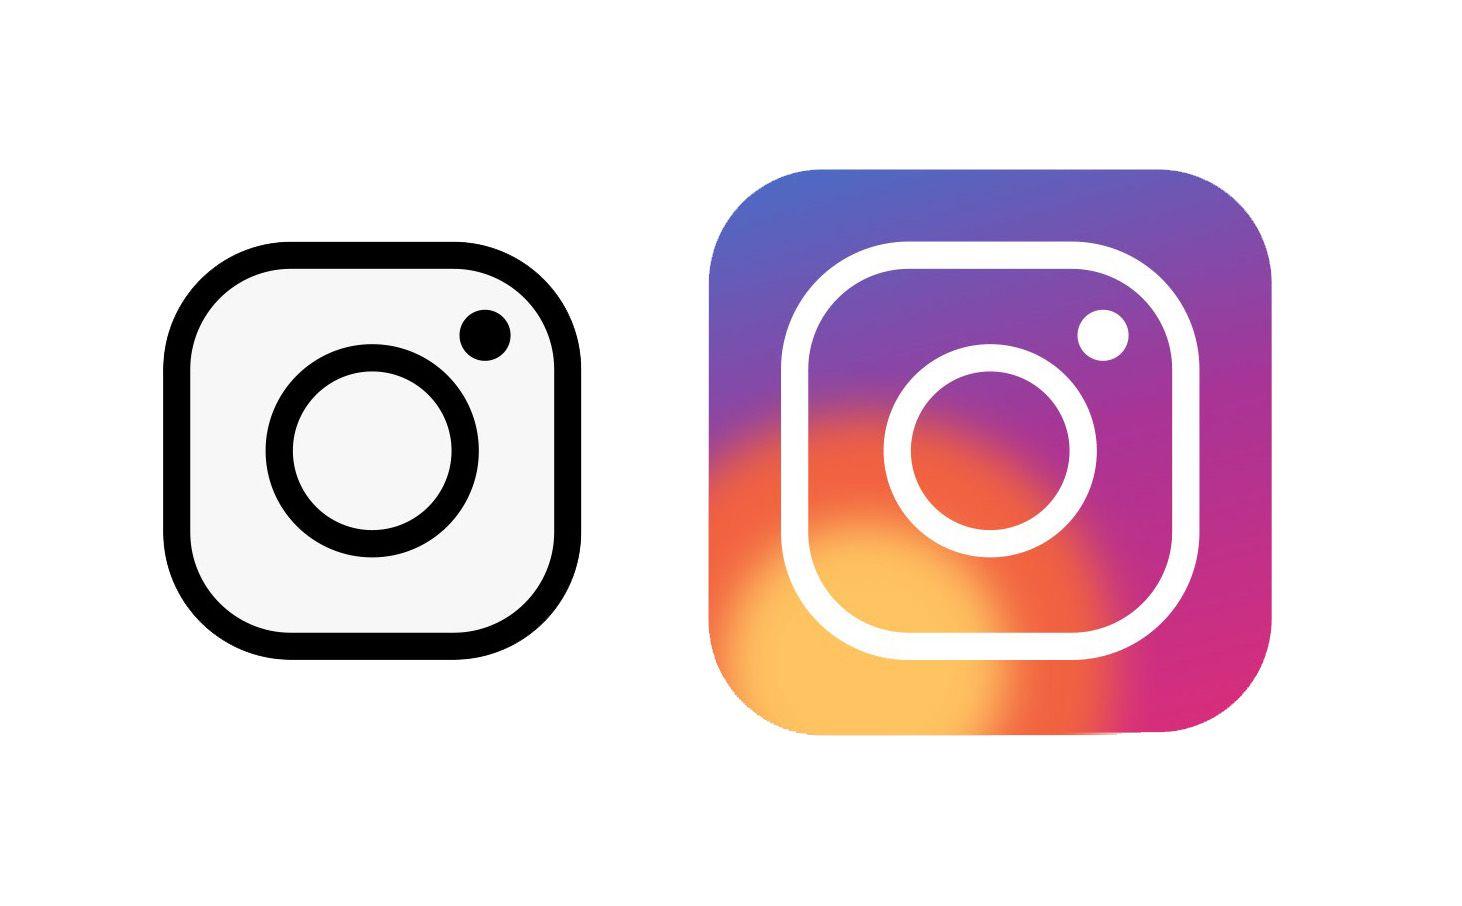 Symbol Instagram Logo Instagram Logo Instagram Symbols New Instagram Logo